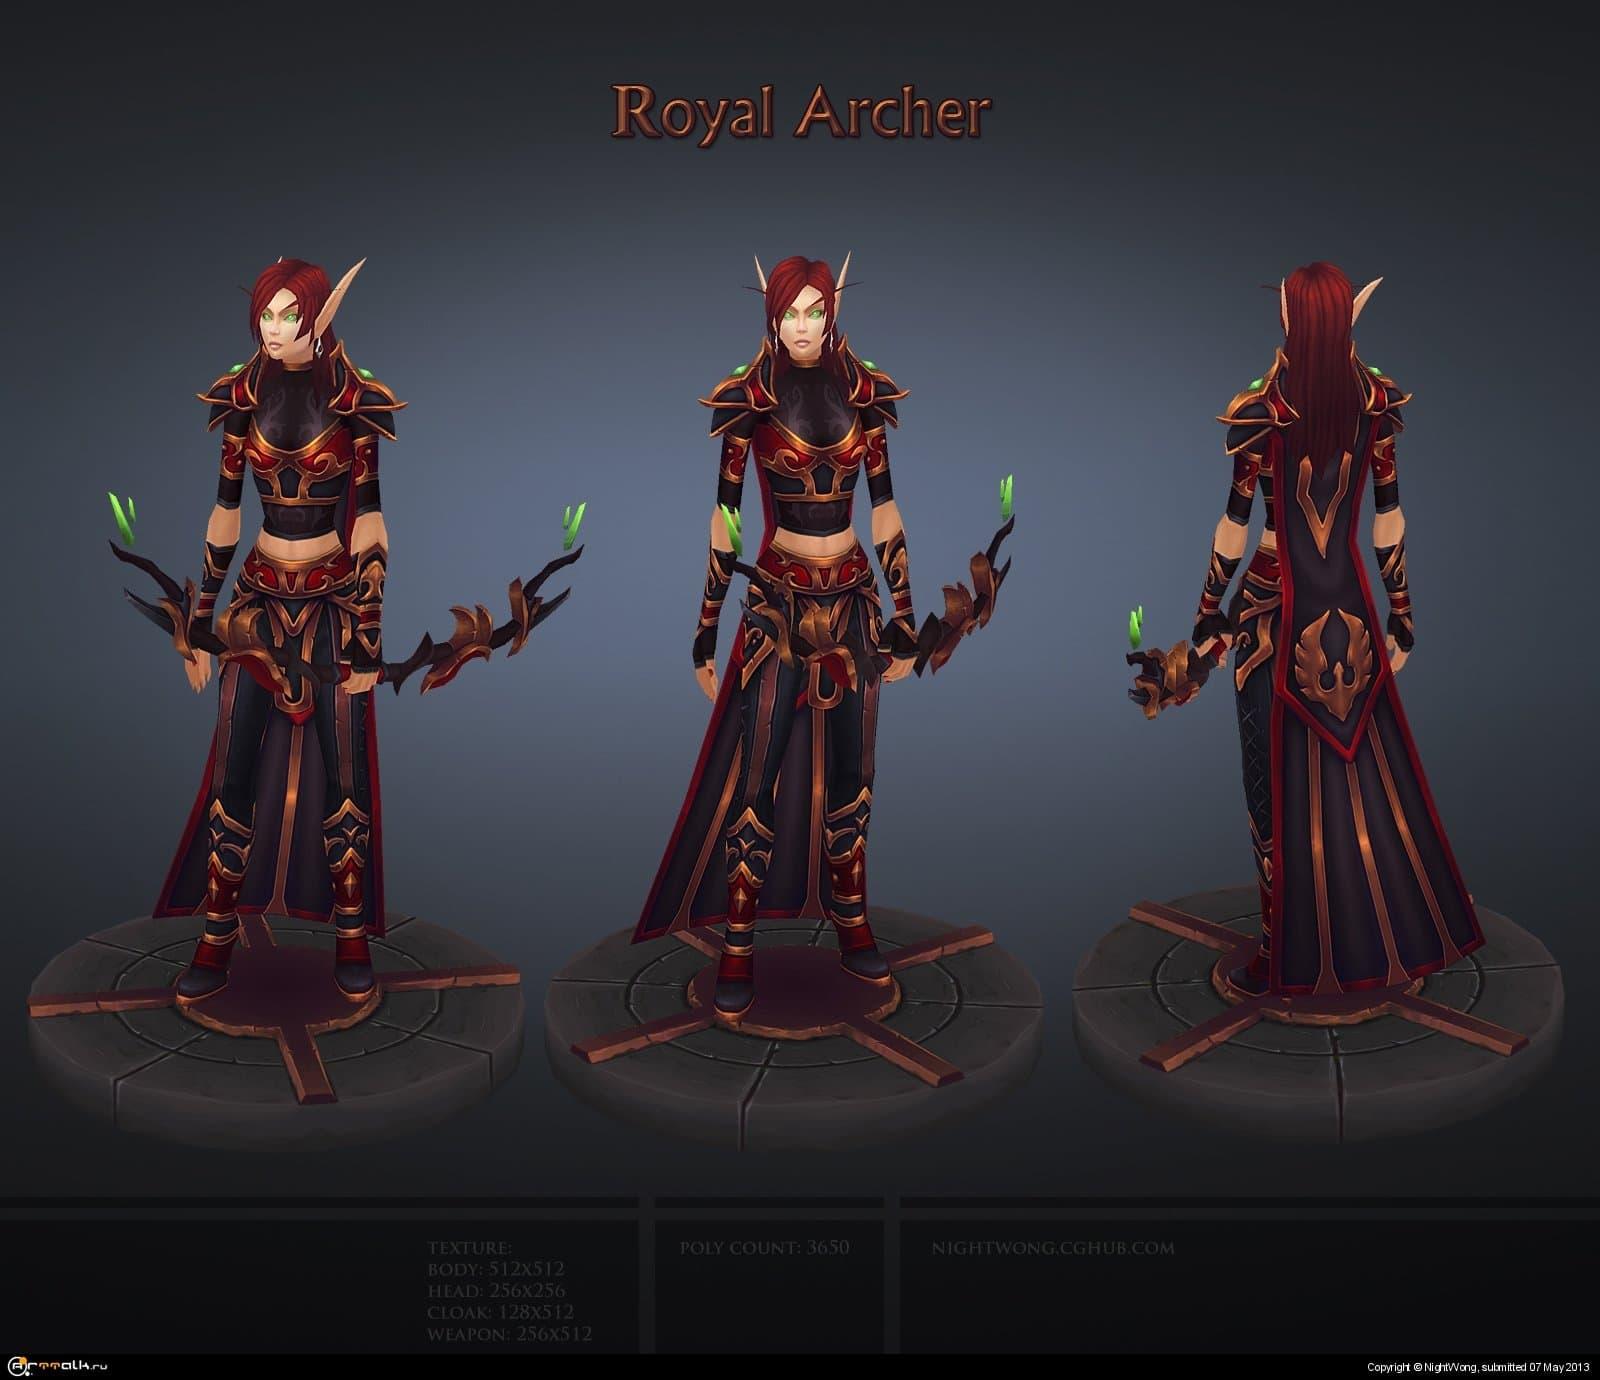 Royal Archer